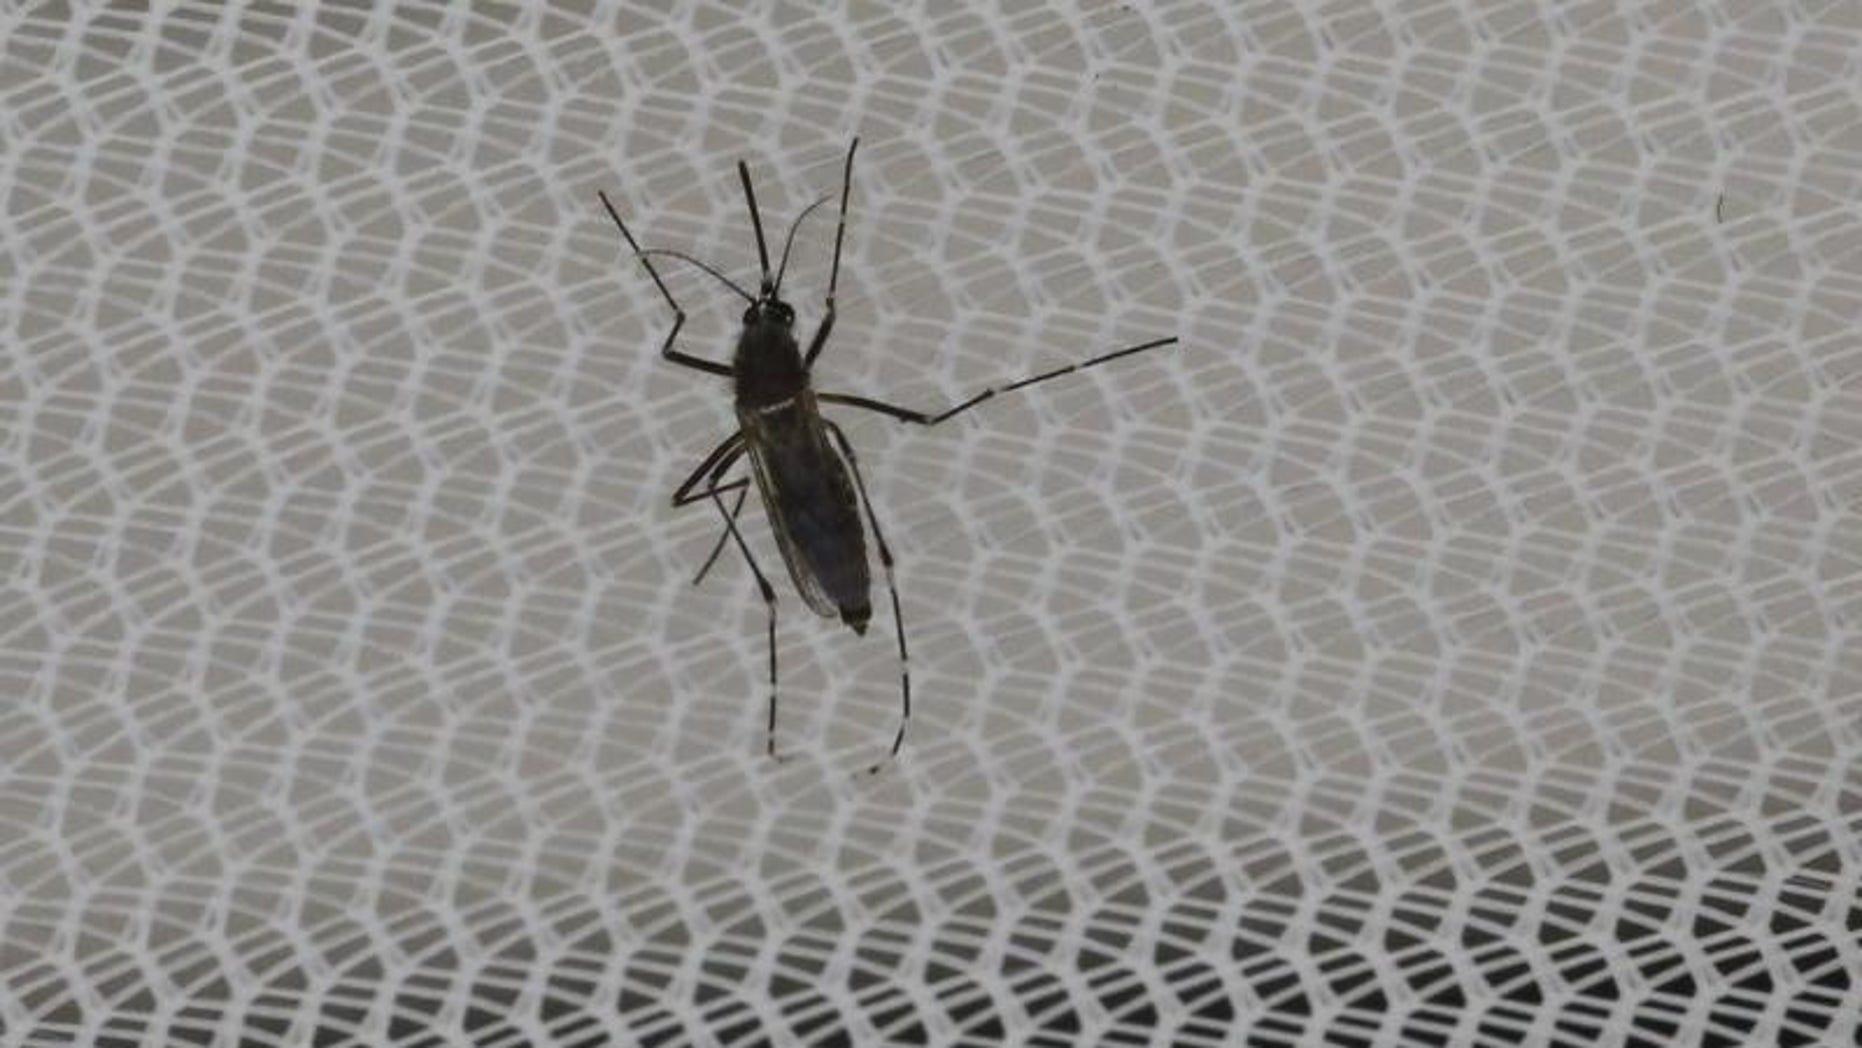 An Aedes aegypti mosquitoe is seen inside the IAEA laboratory in Seibersdorf